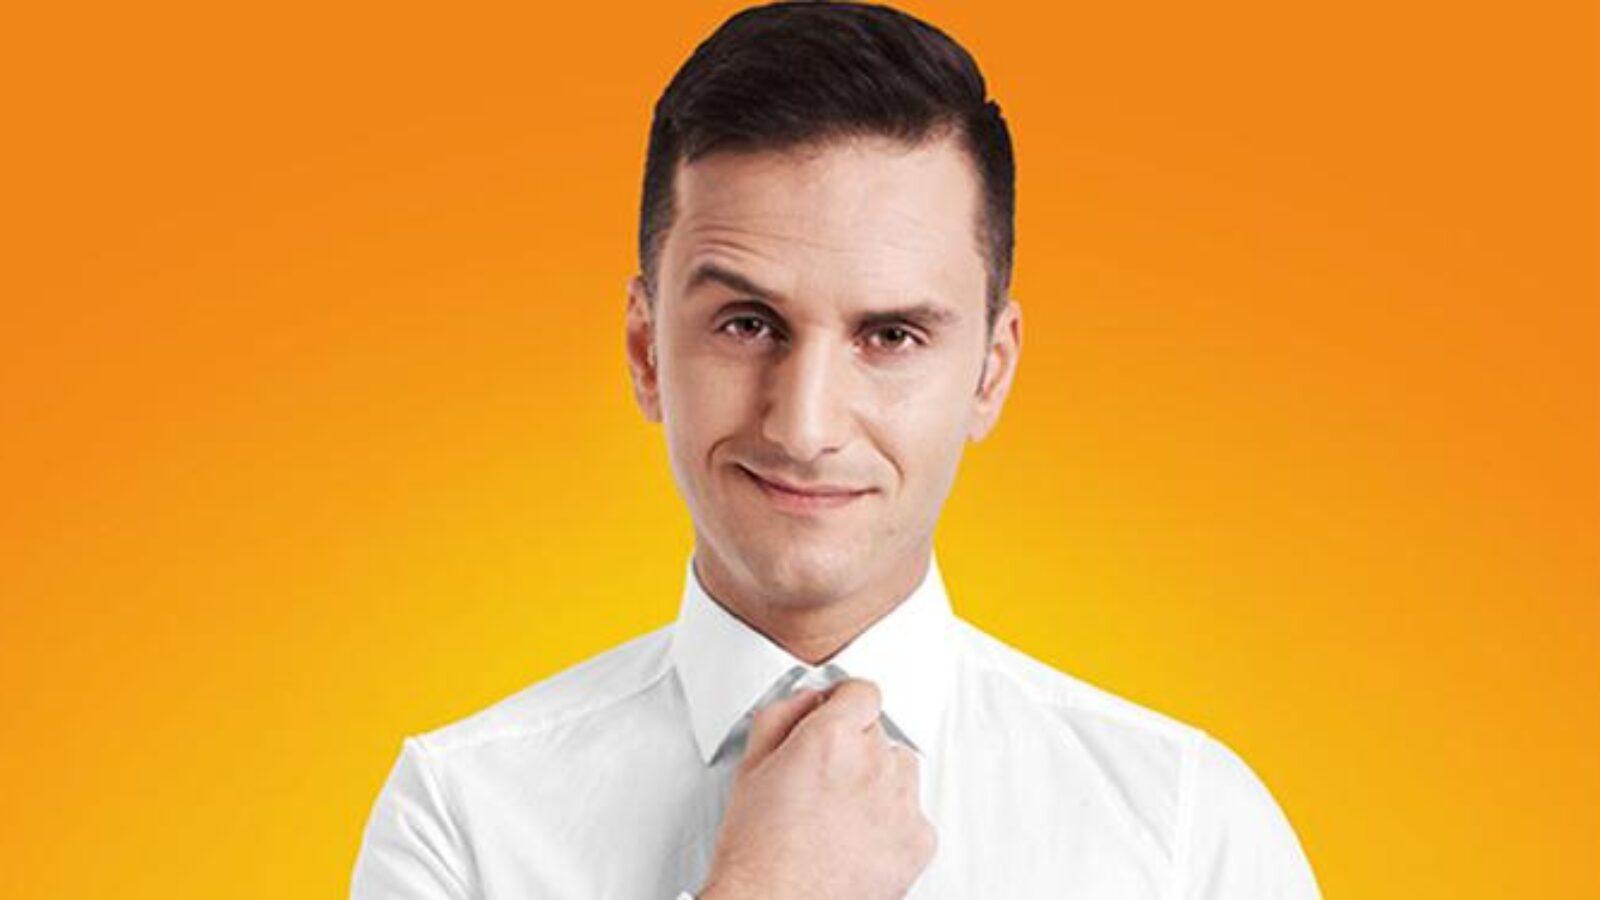 OXMOX Comedy-Tipp: Özcan Cosar am 30.10. im Gruenspan